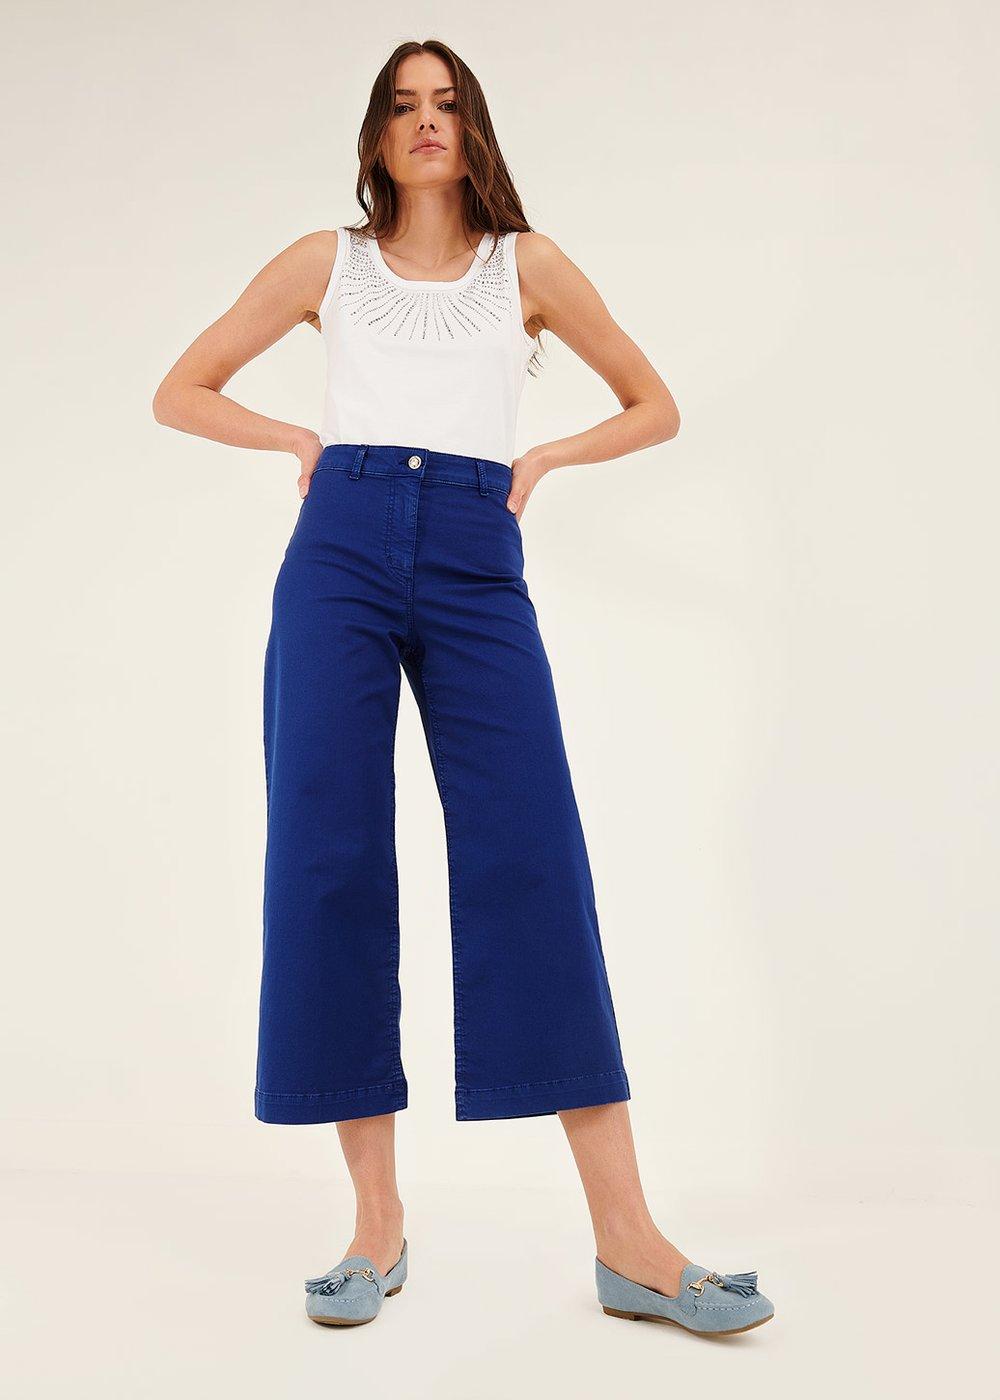 Pantalone Megan gamba larga - Abisso - Donna